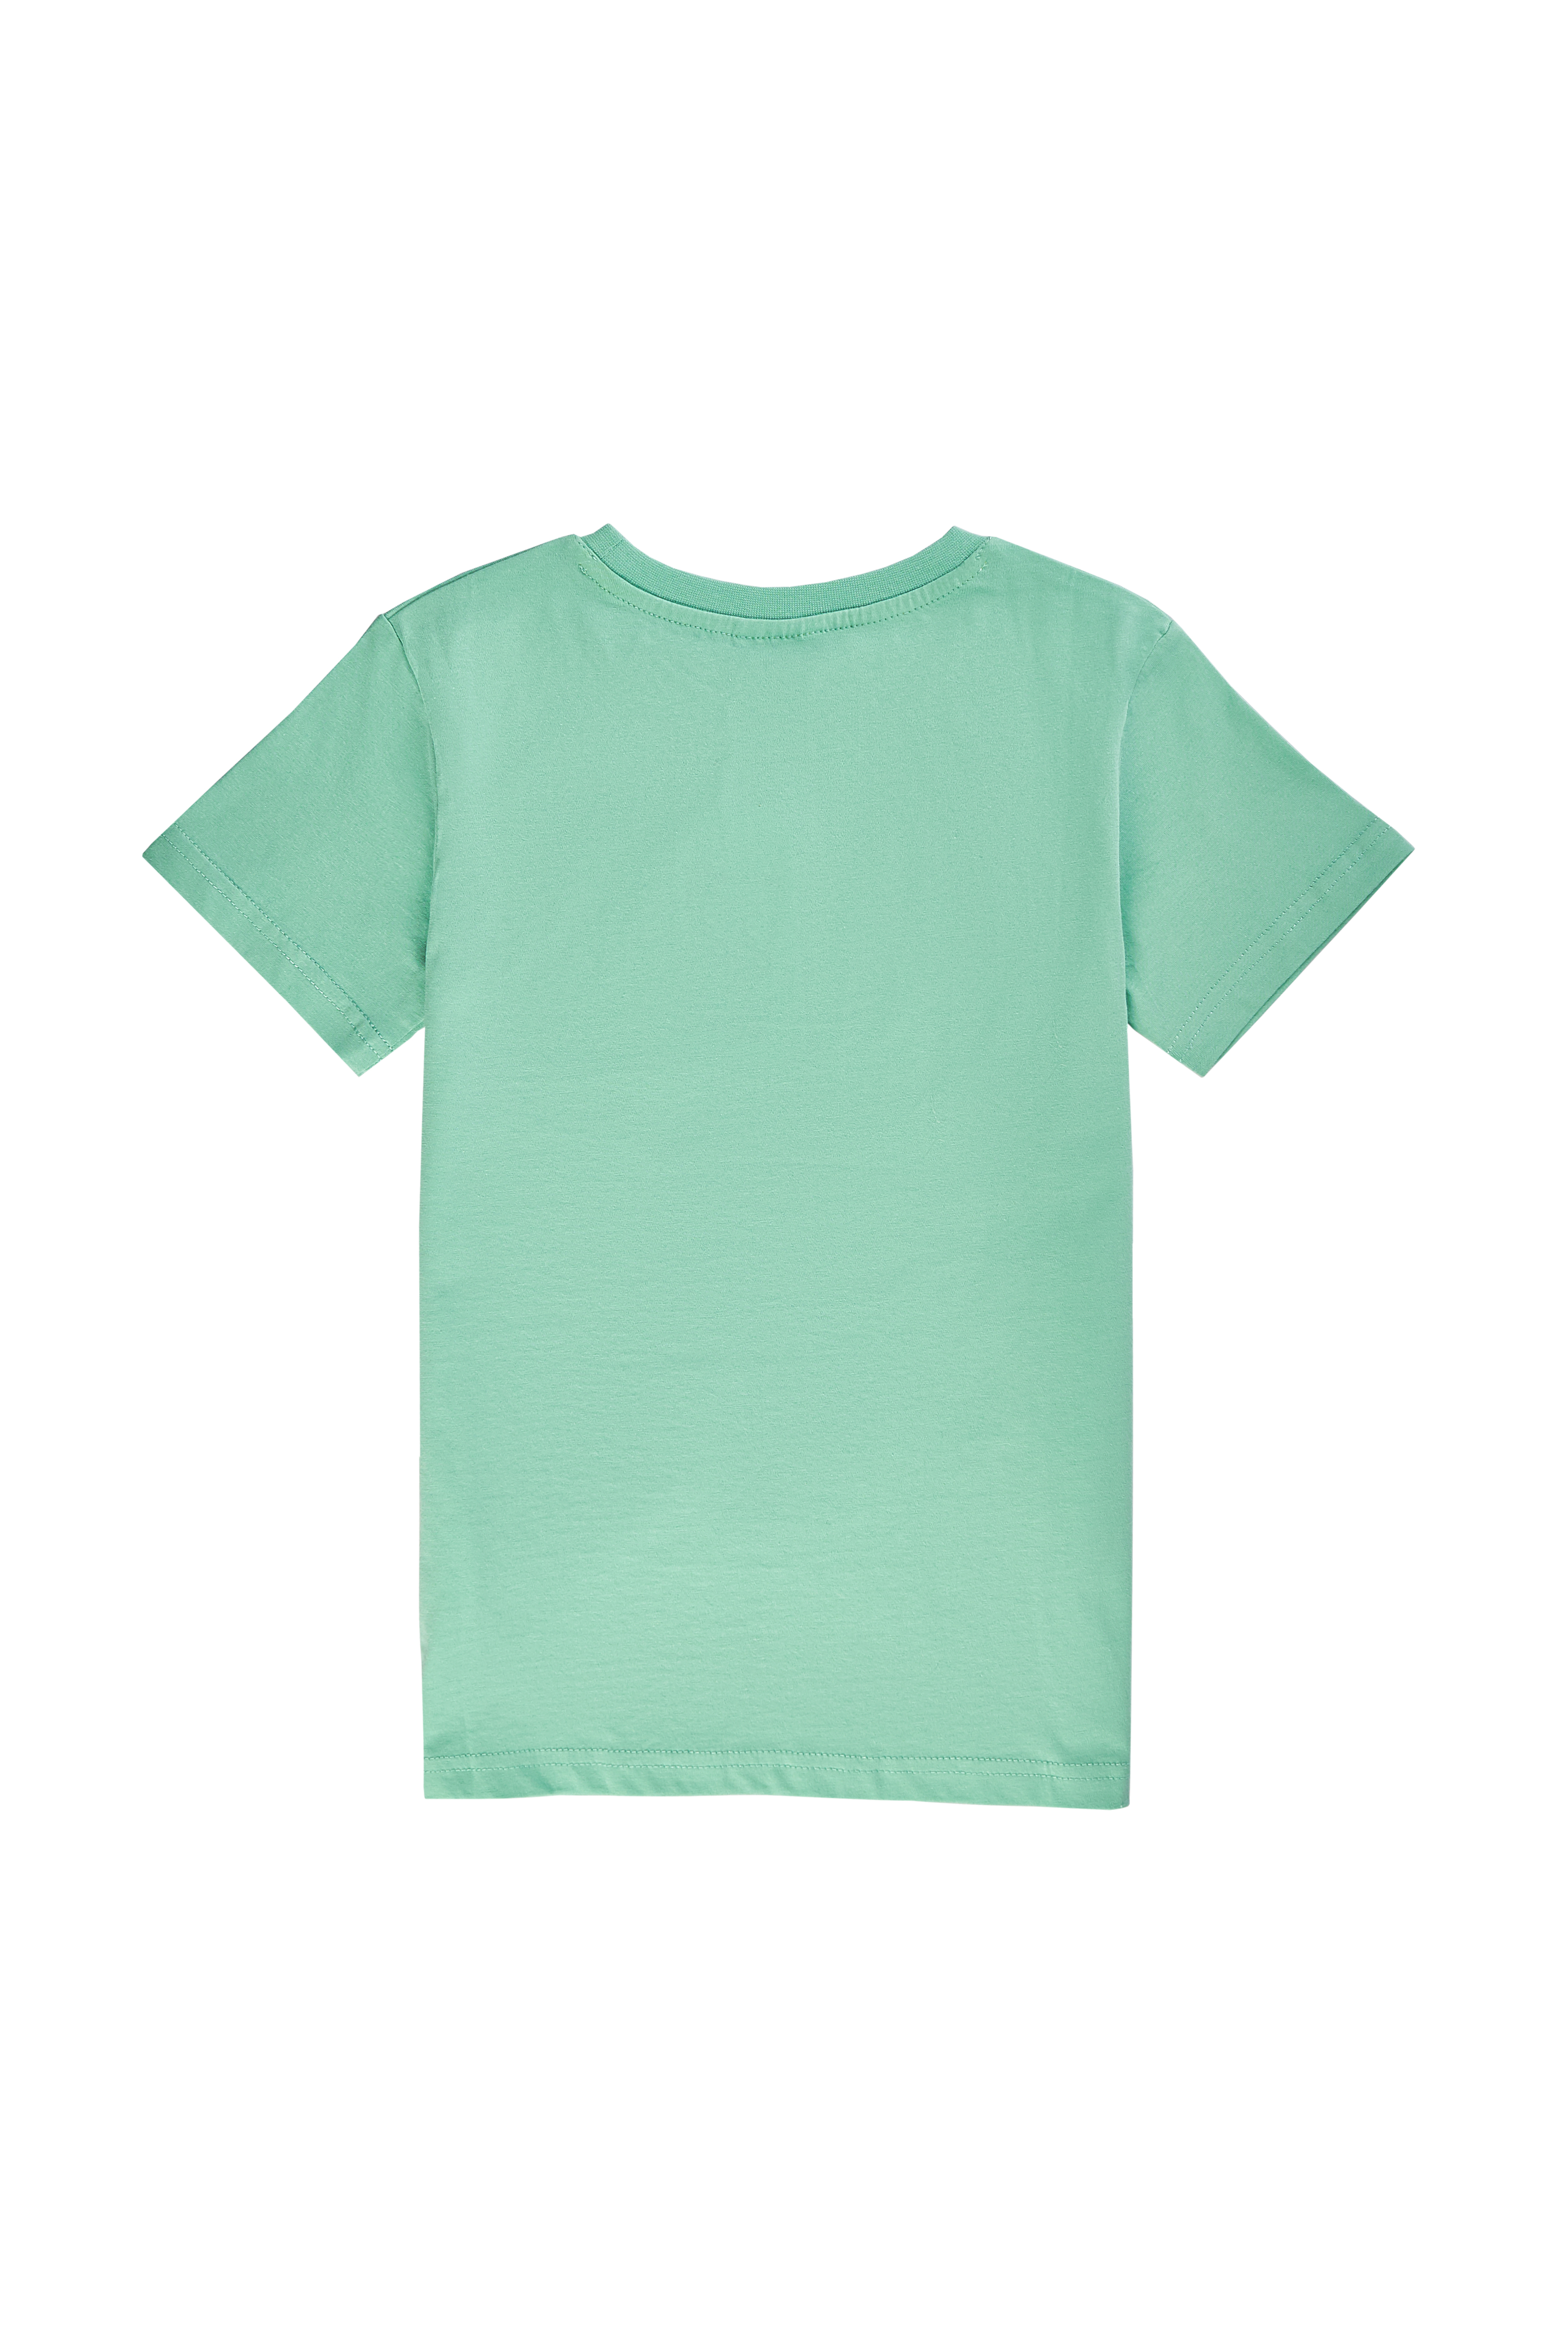 Chlapecké tričko Urban Riders - zelená Navy, Zelená